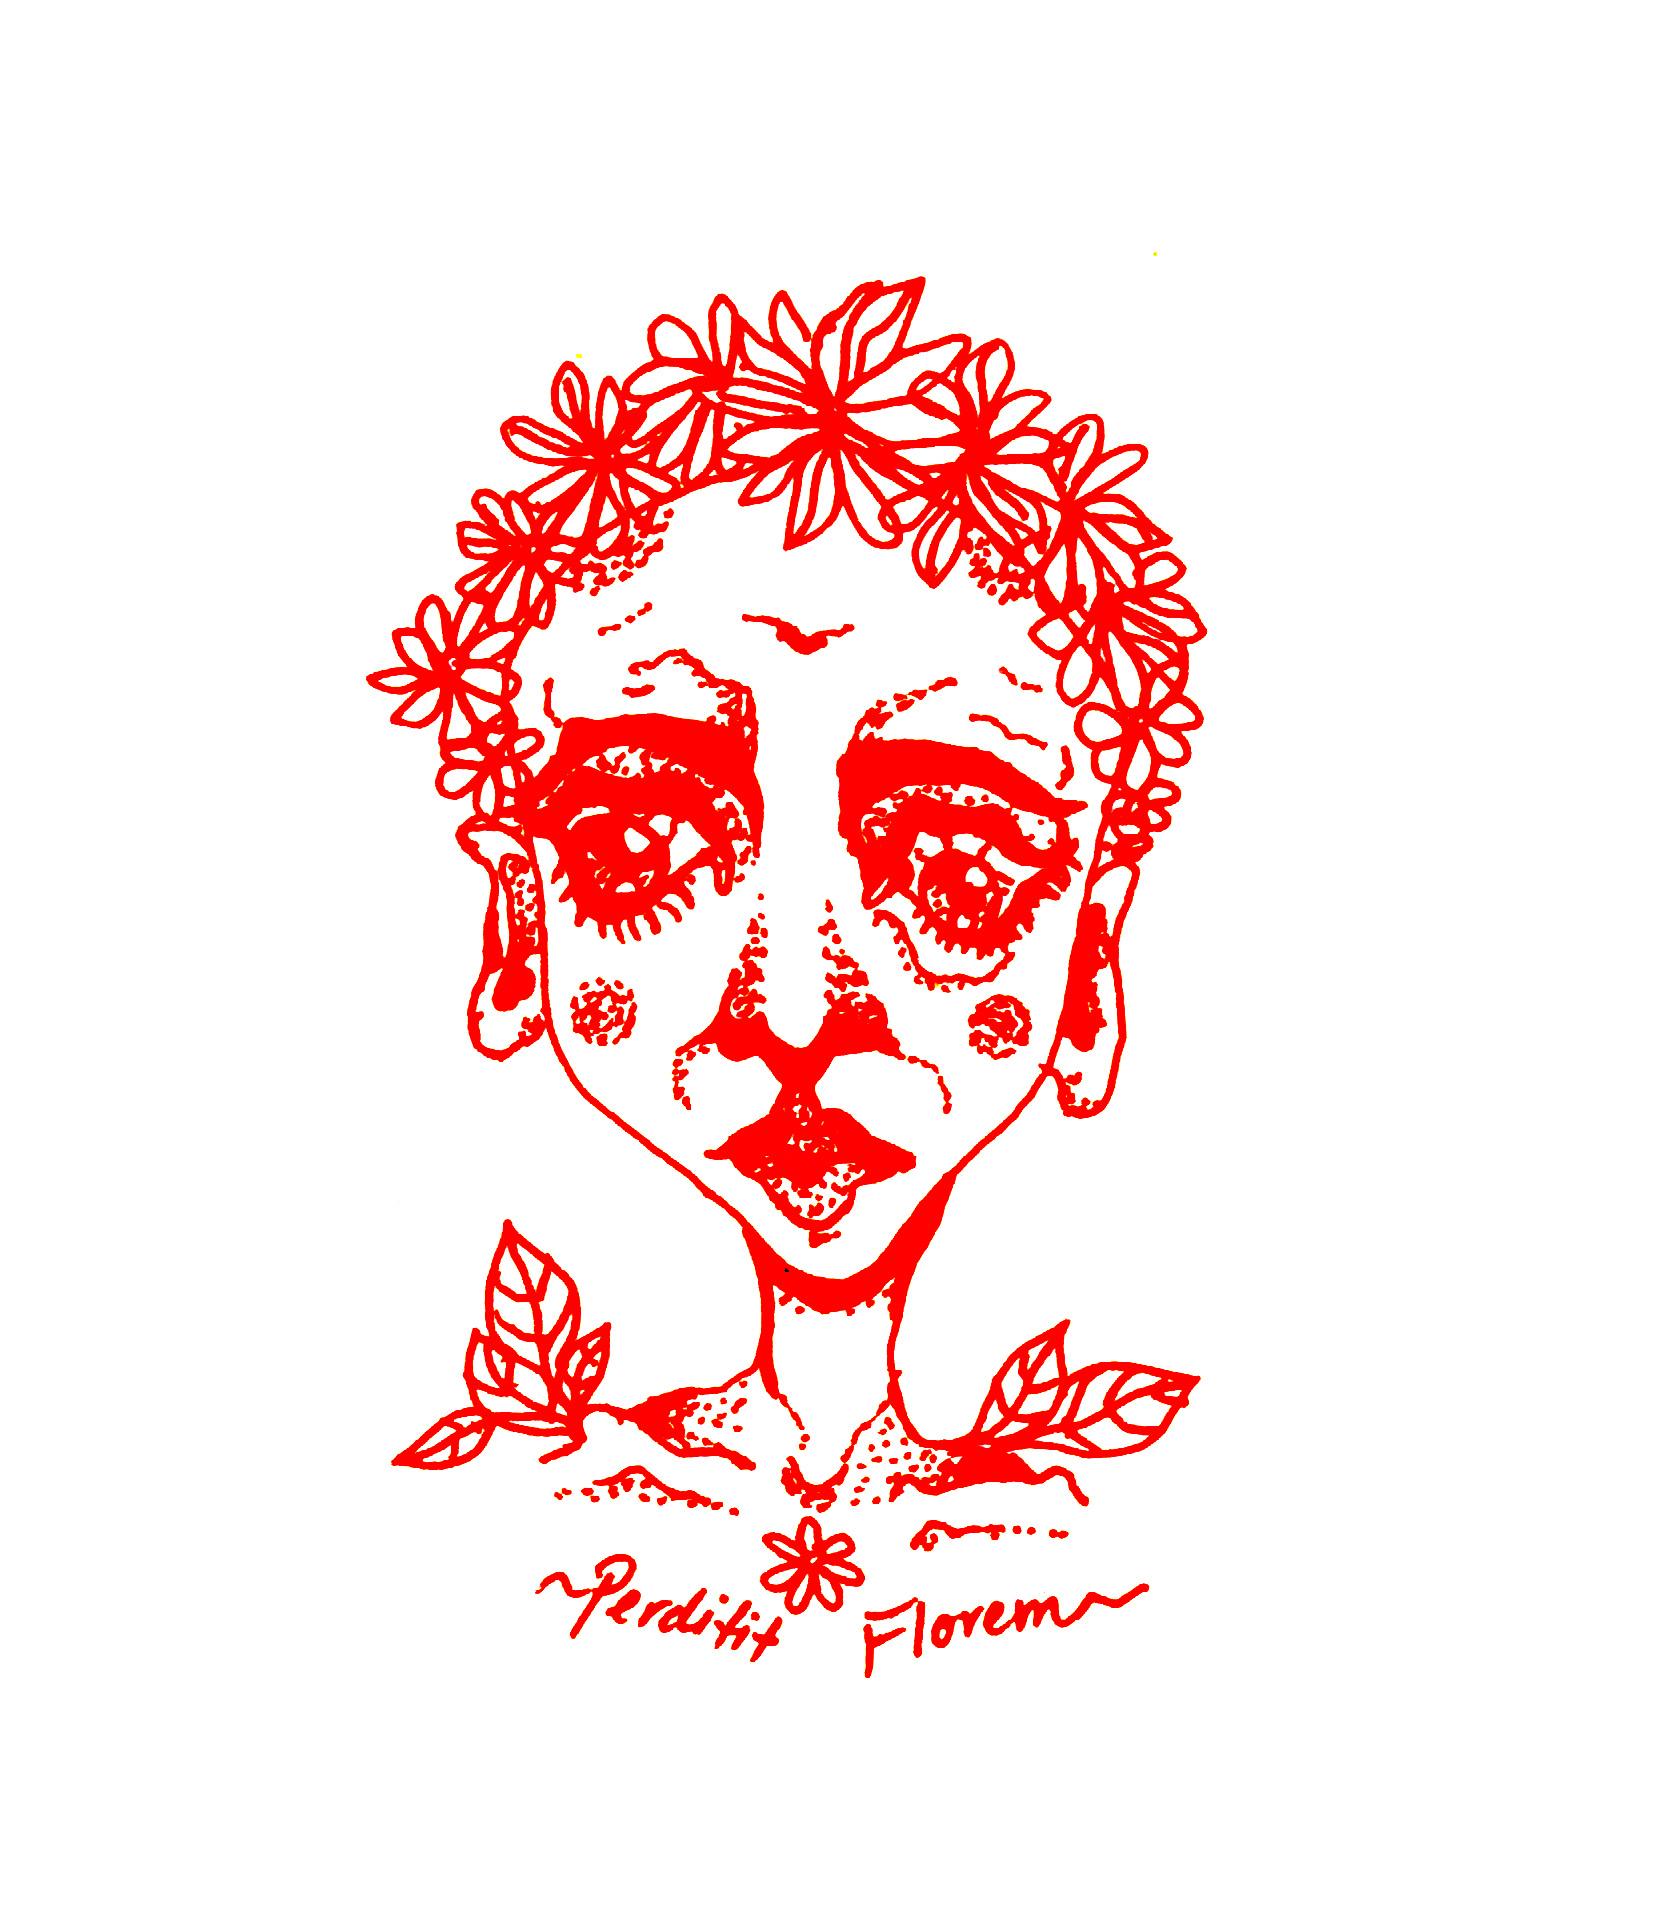 Perdit Florem